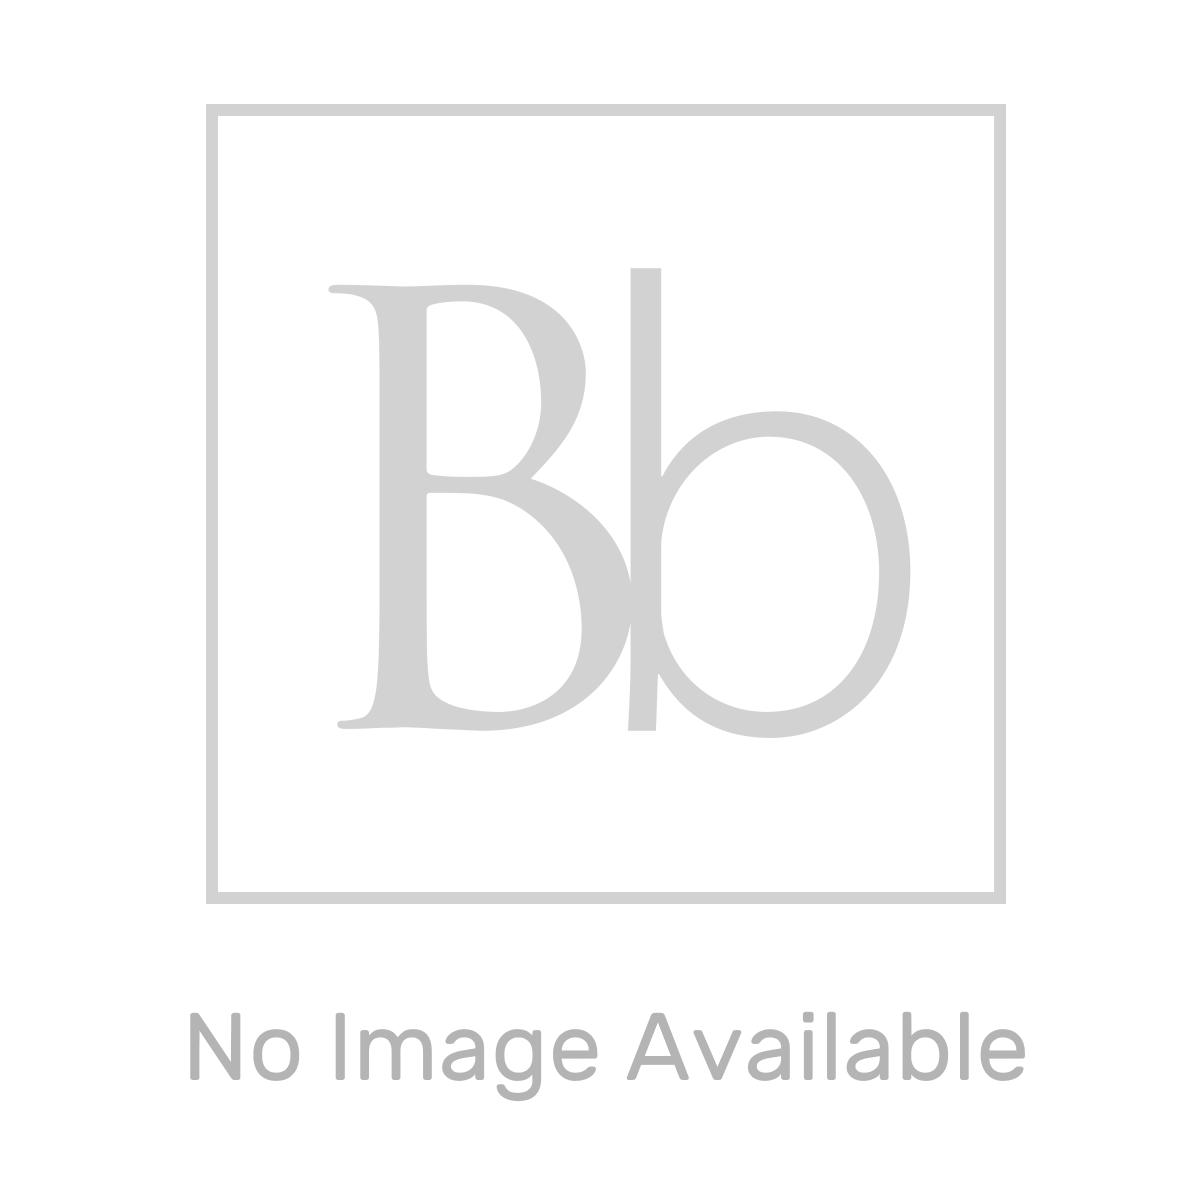 McAlpine WC-EXTB 3½